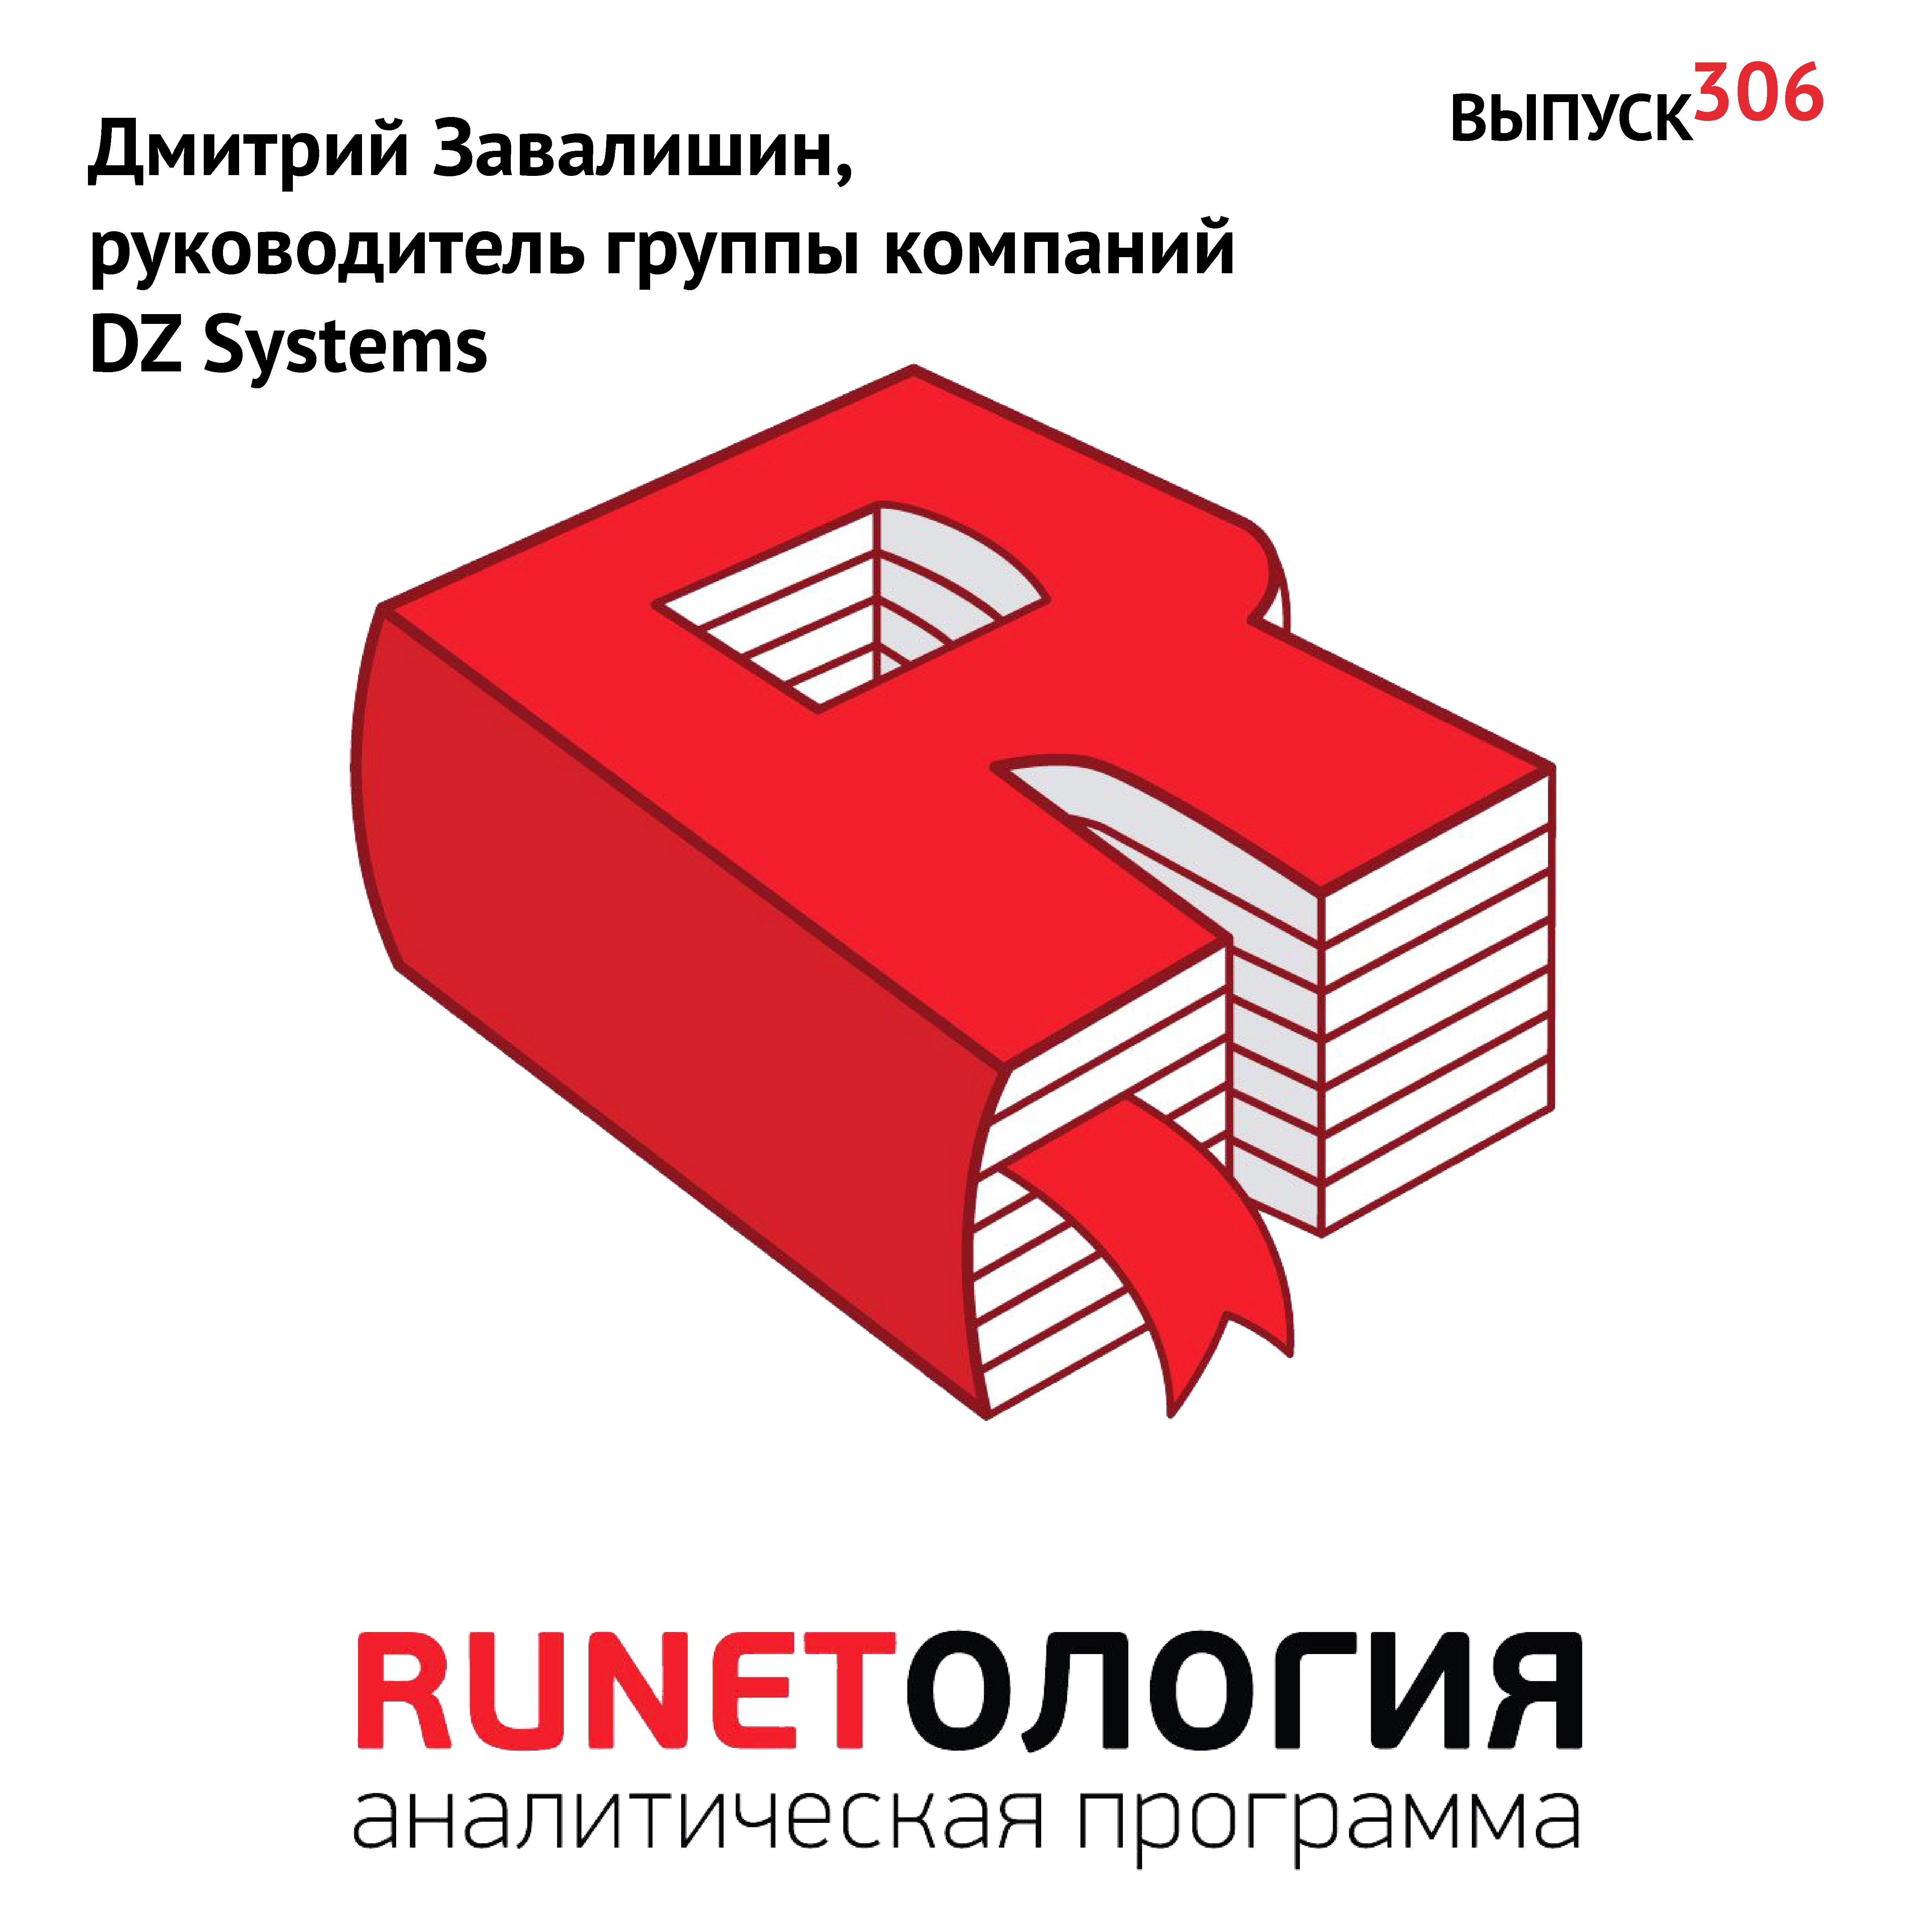 Максим Спиридонов Дмитрий Завалишин, руководитель группы компаний DZ Systems цена